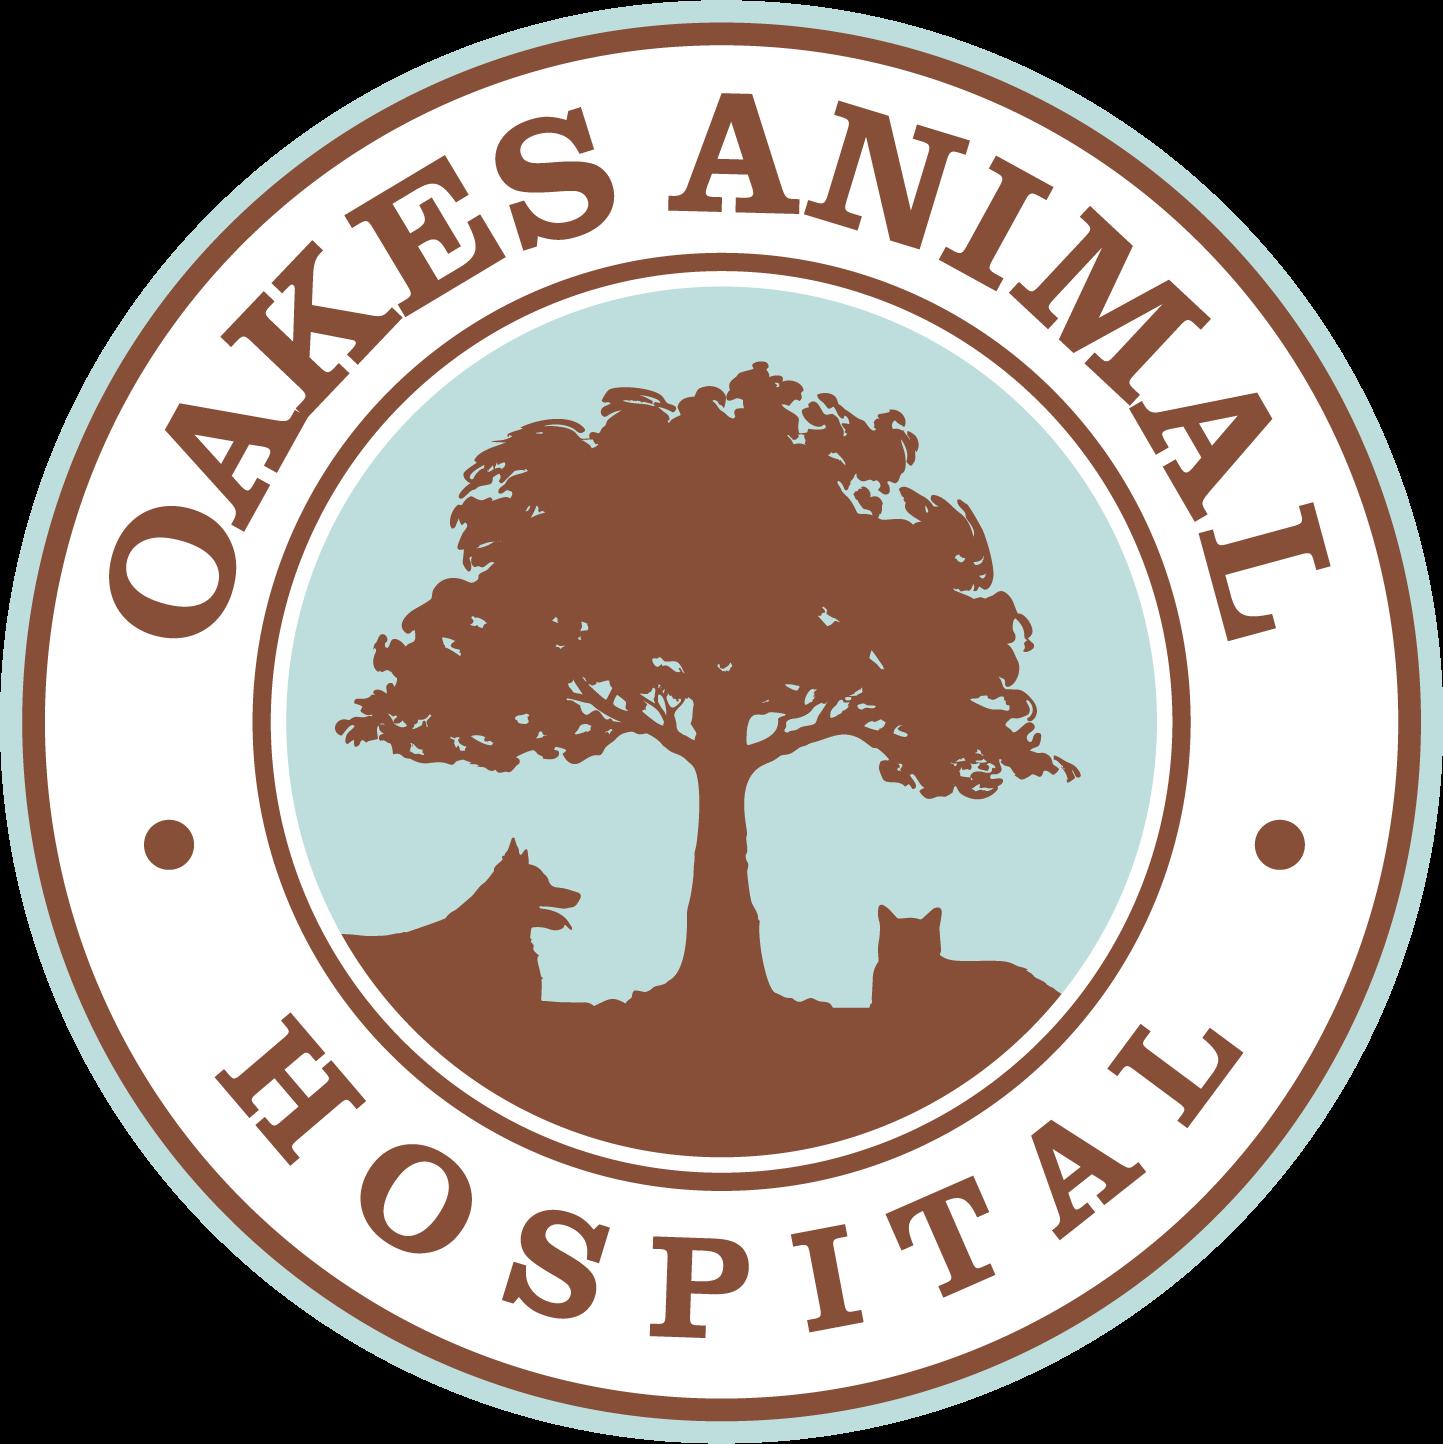 Oakes Animal Hospital logo